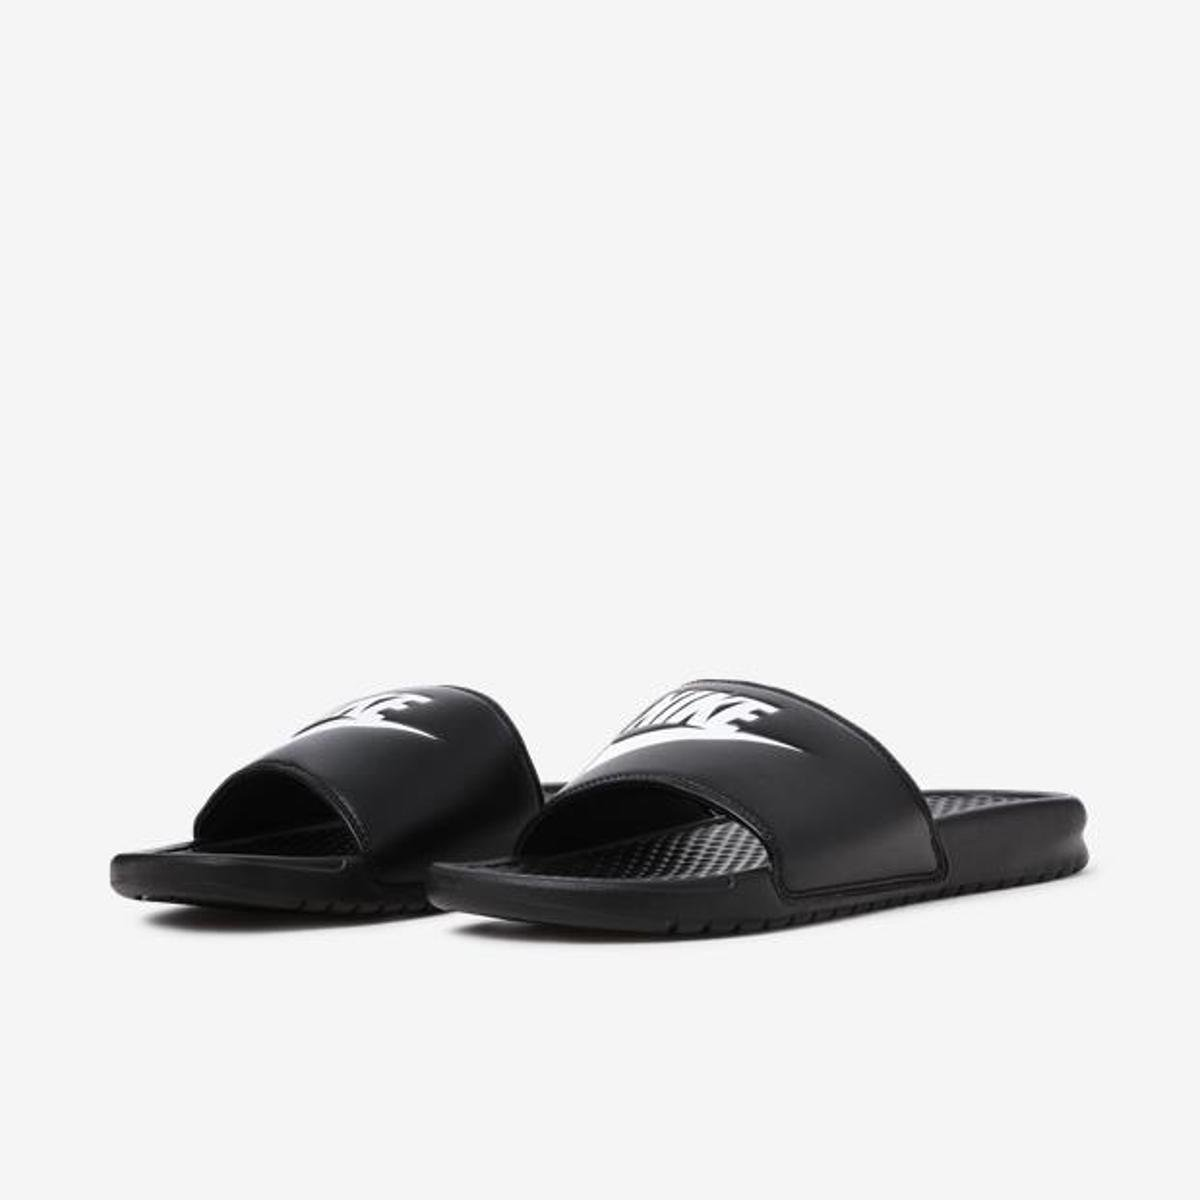 Sandália Nike Benassi JDI Masculina - Tam: 39.5 - 3